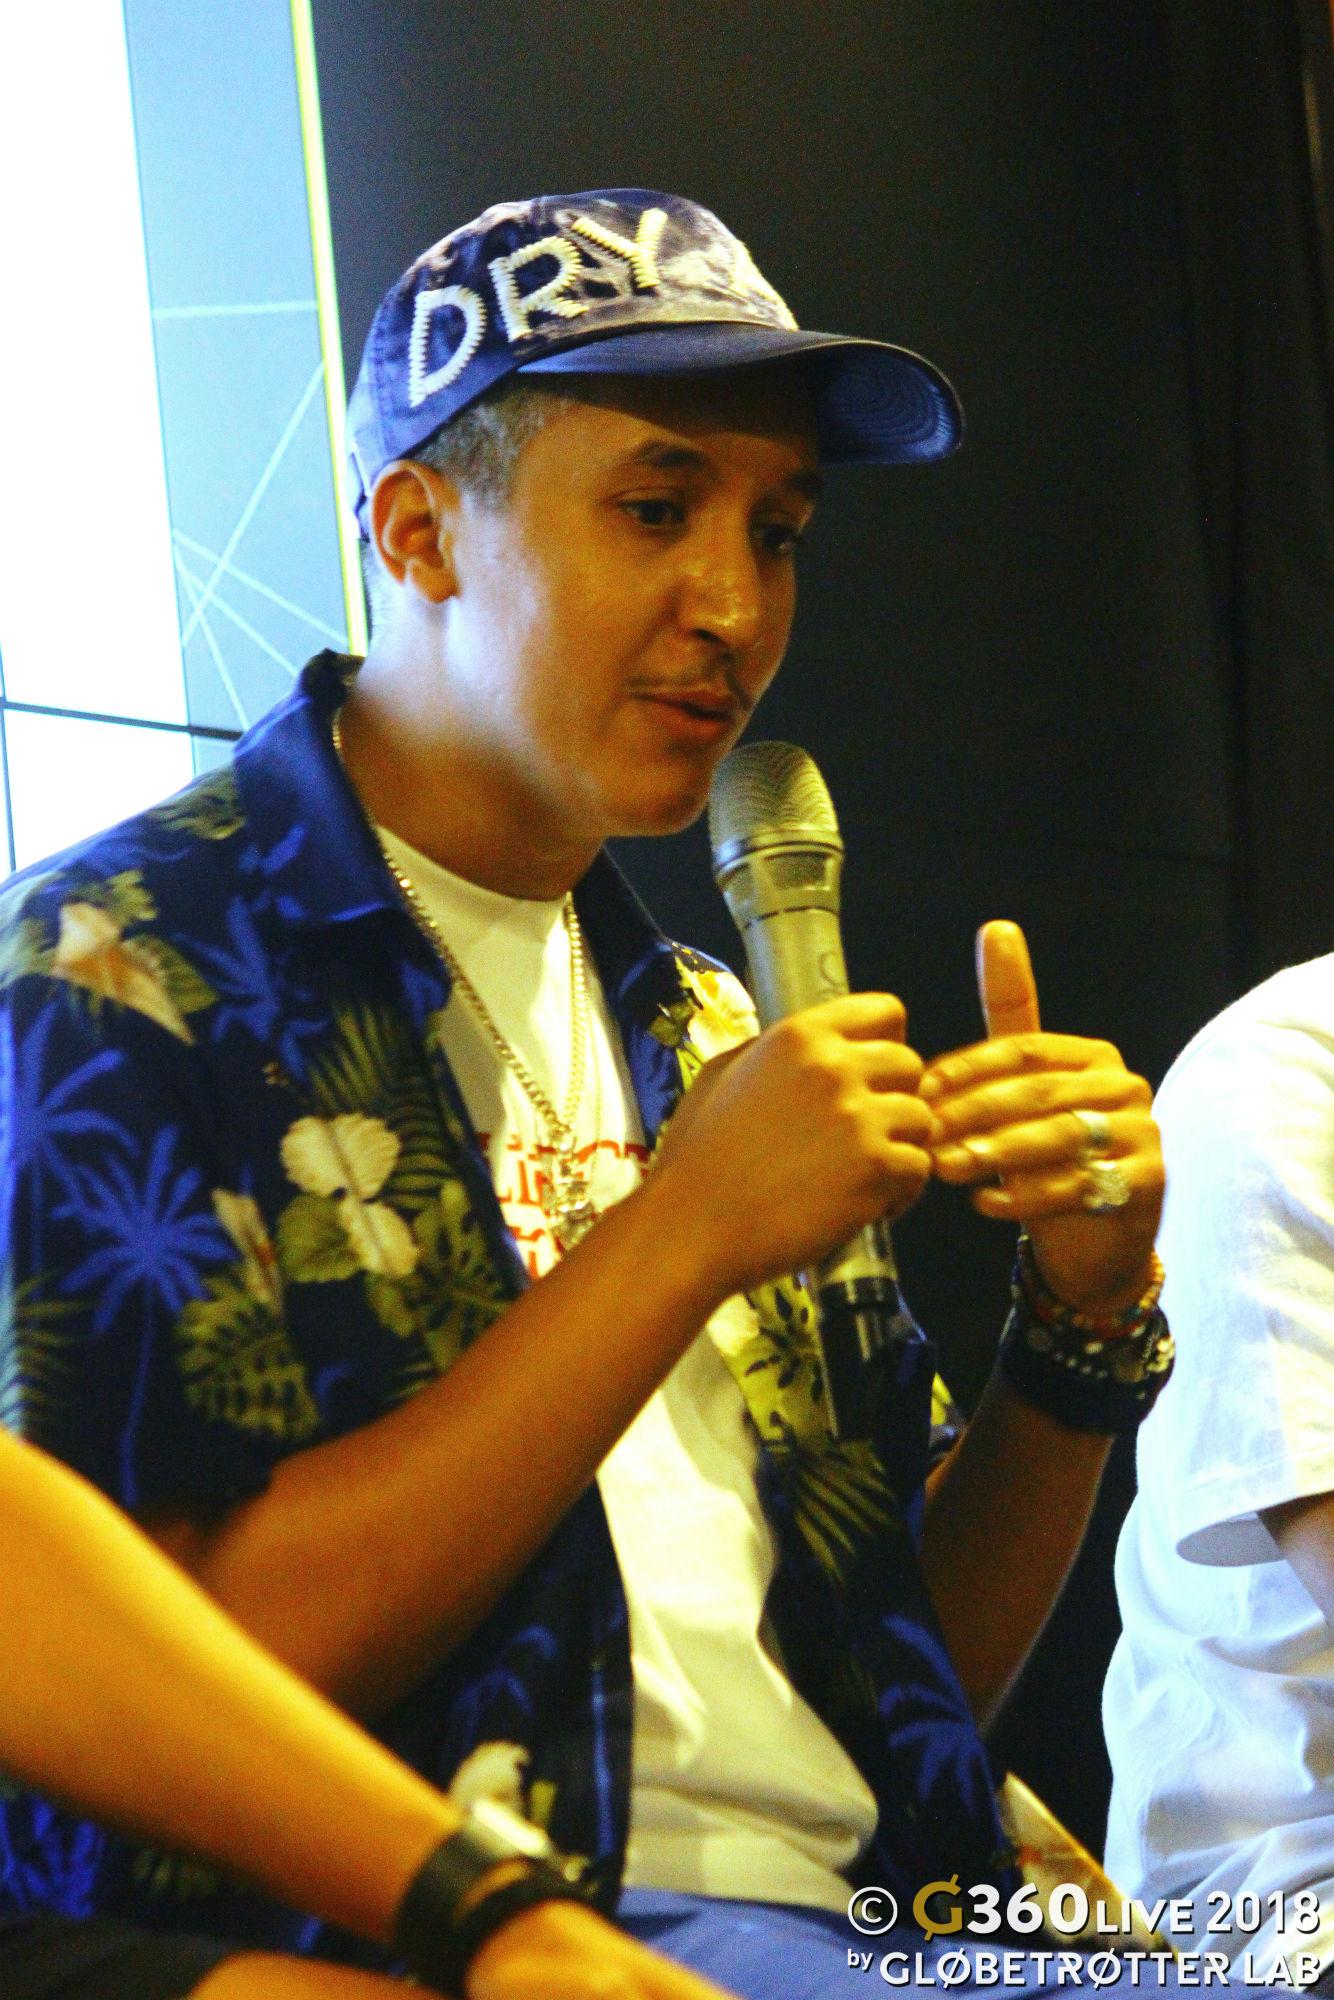 Abderrahmane Trabsini, Co-Founder of Daily Paper